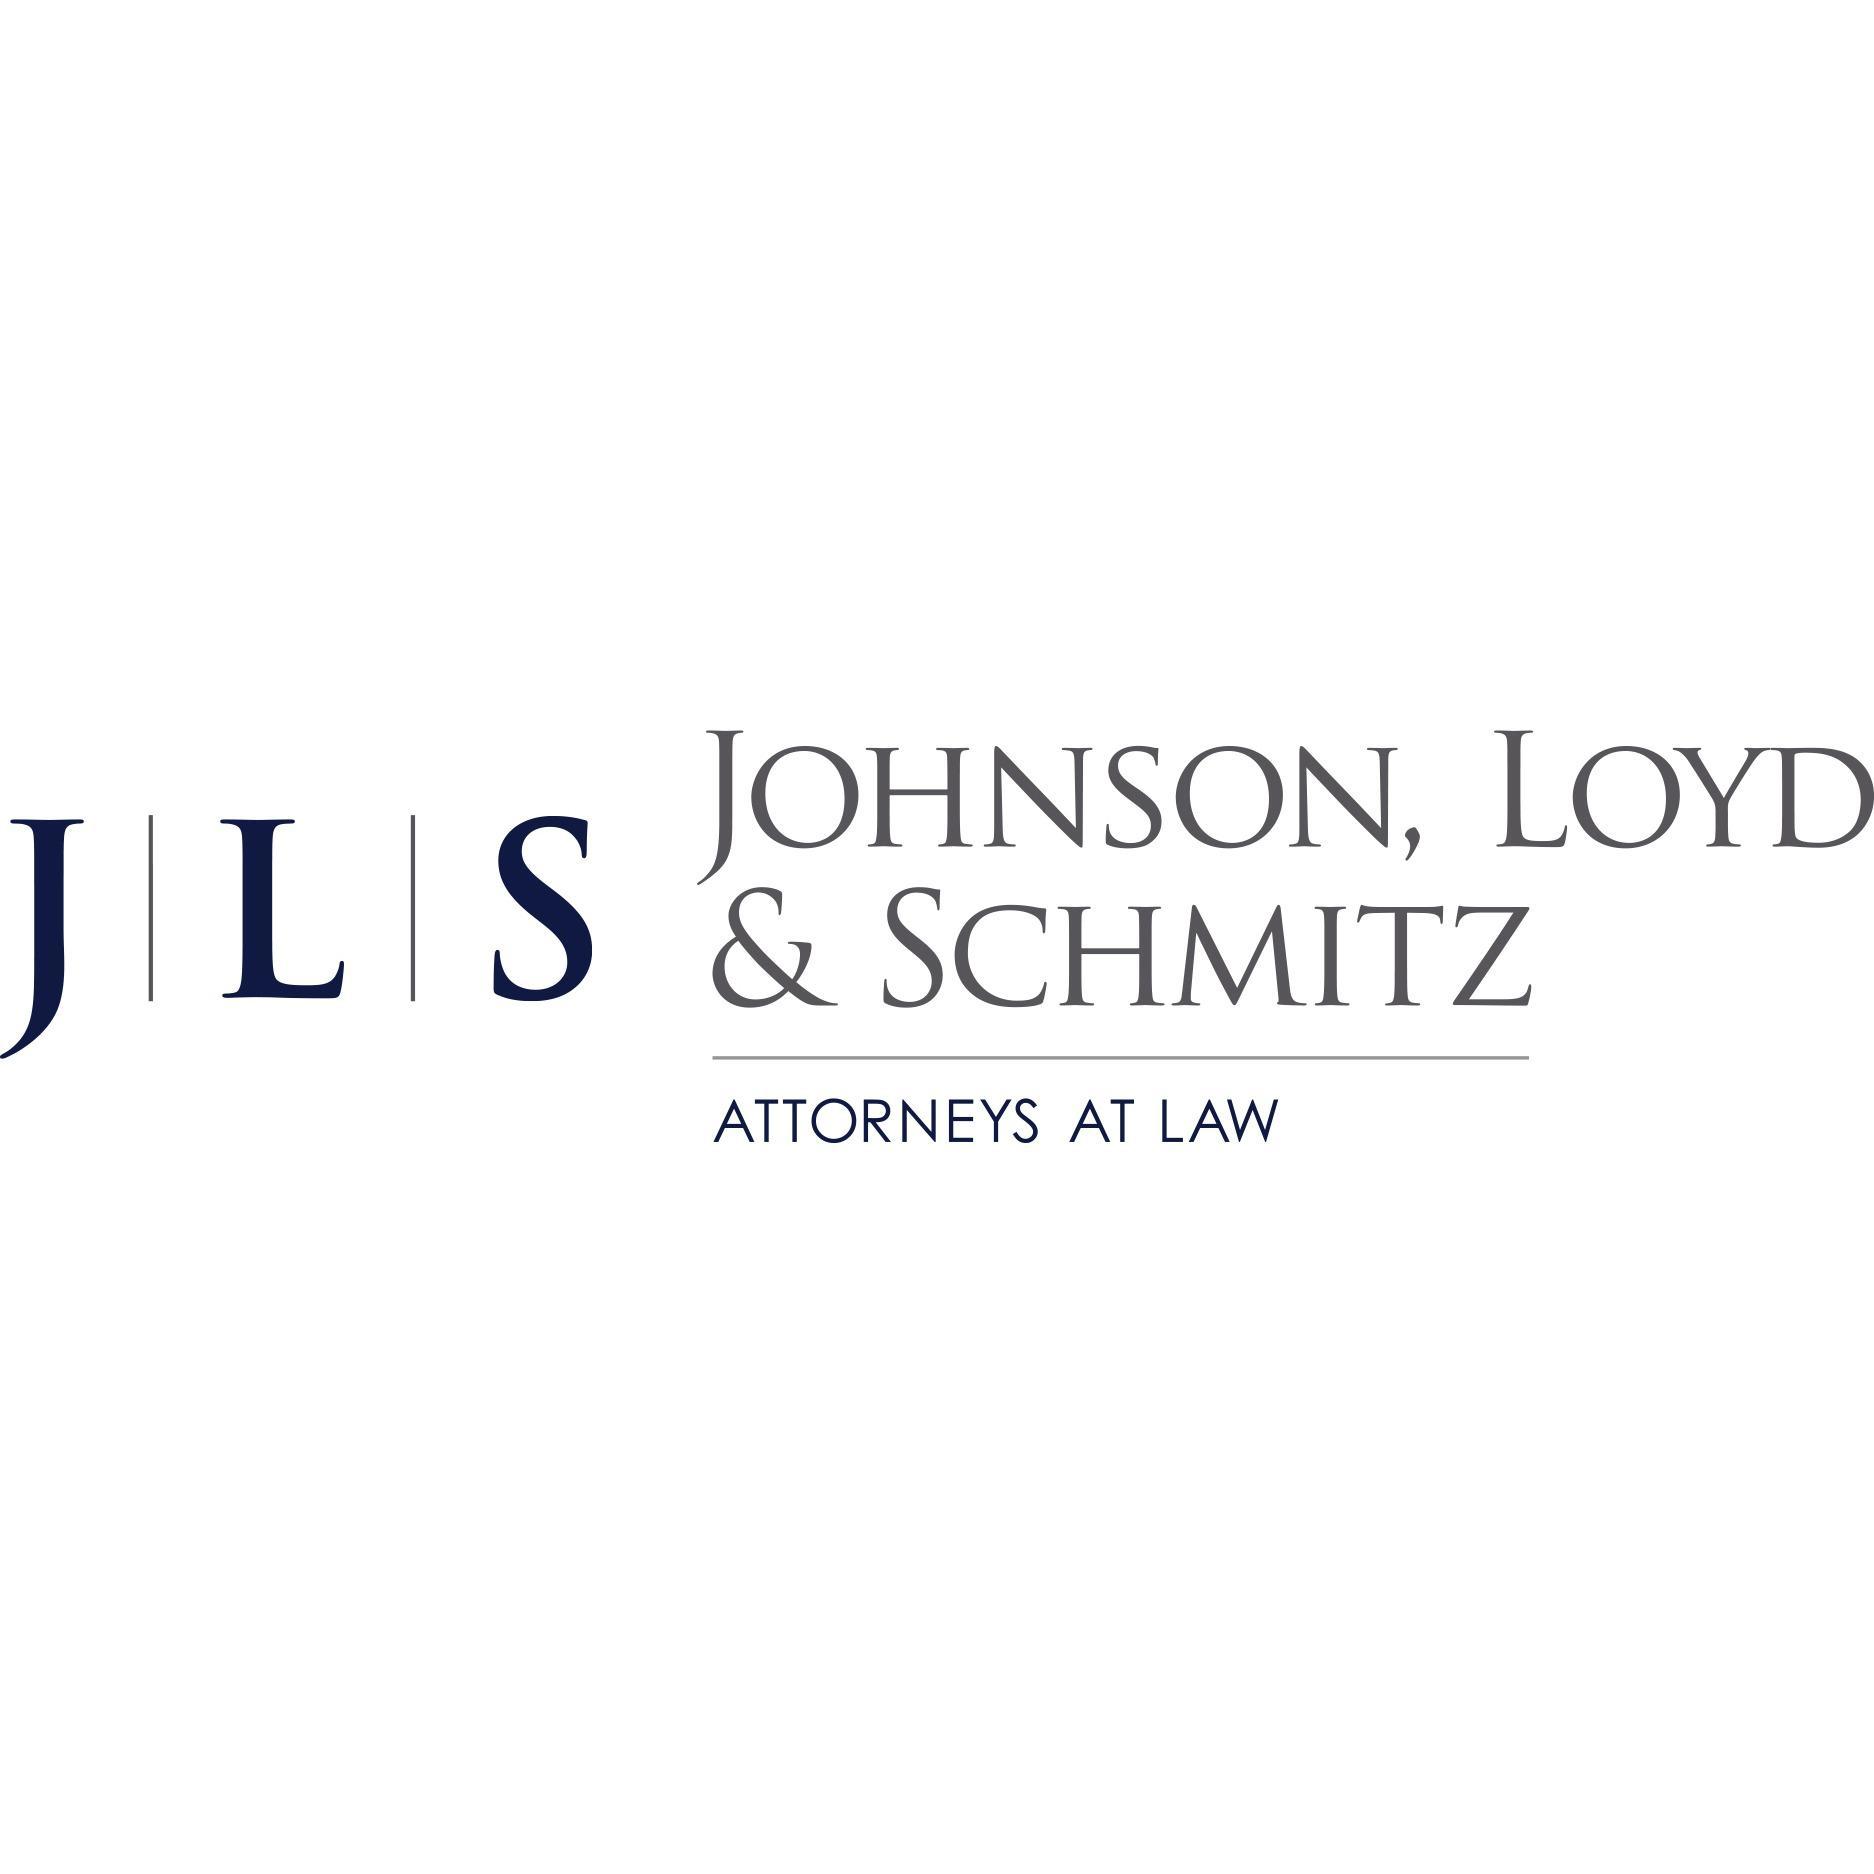 Johnson, Loyd, & Schmitz, Attorneys At Law